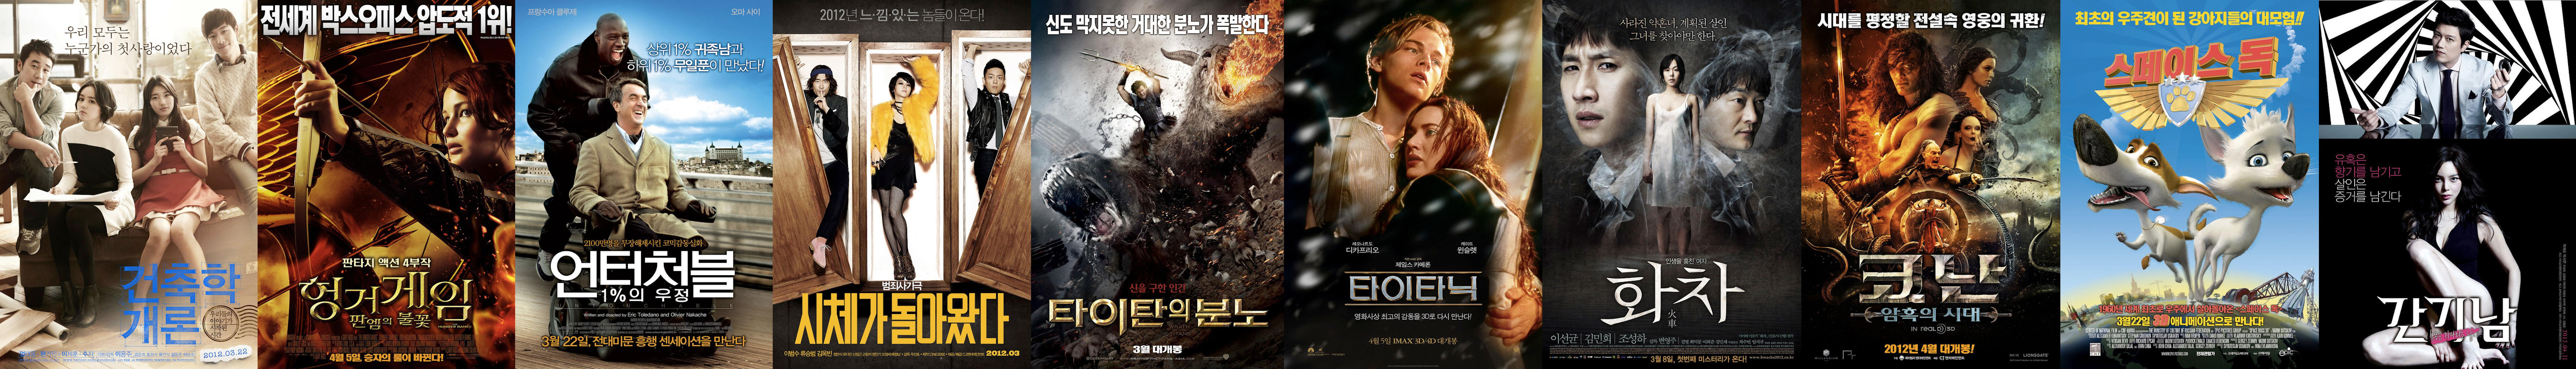 Image Result For Top Grossing Korean